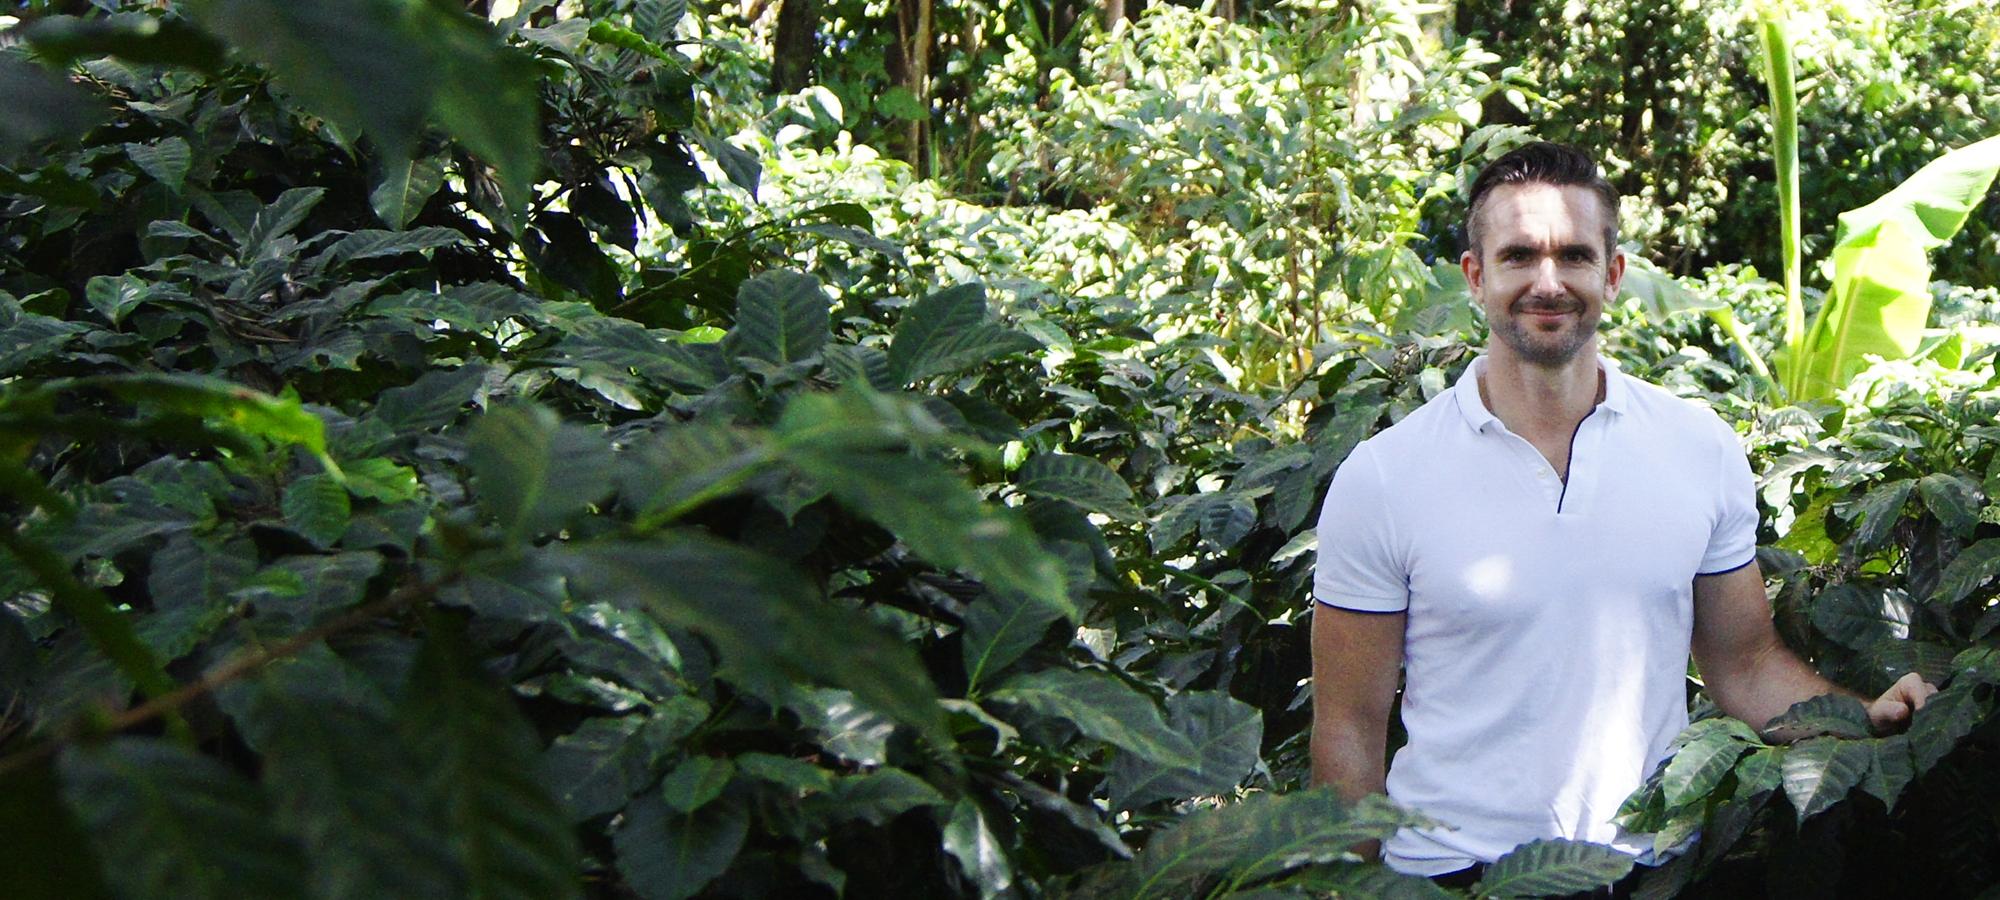 András Koroknay-Pál, Head of Sourcing, Green Coffee